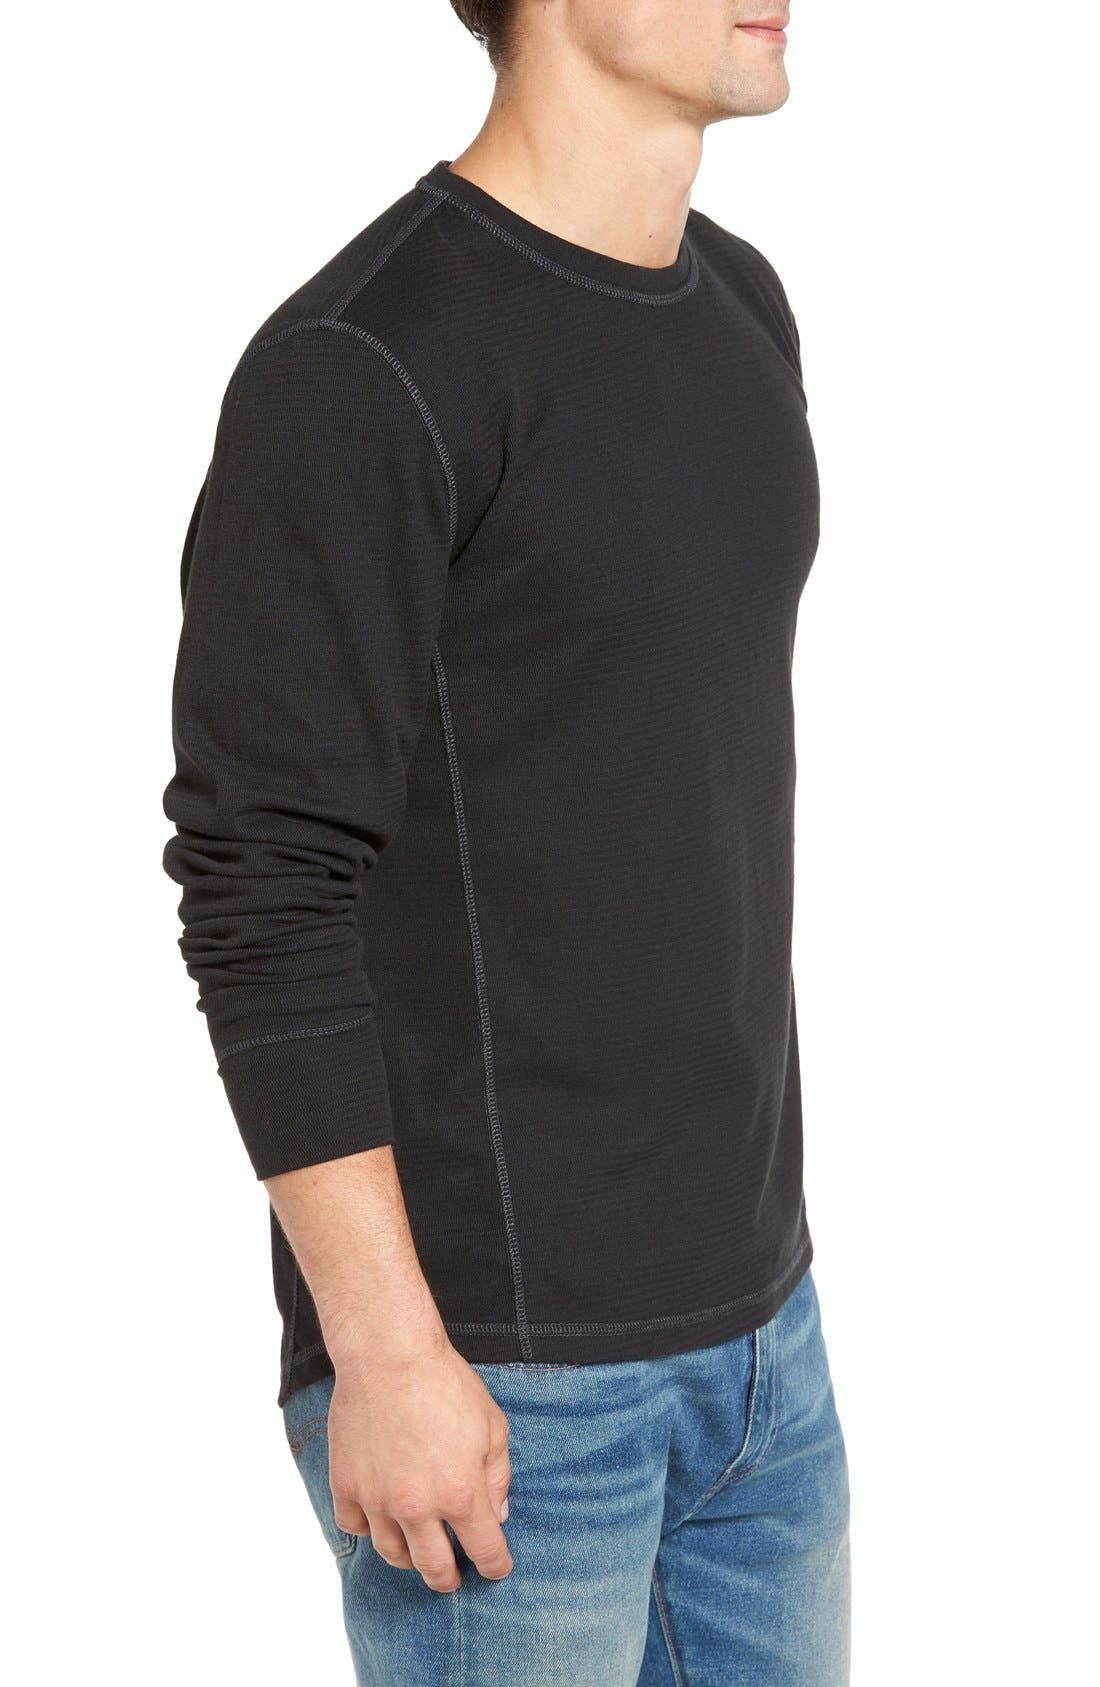 Larsen Zigzag Thermal T-Shirt,                             Alternate thumbnail 3, color,                             Black